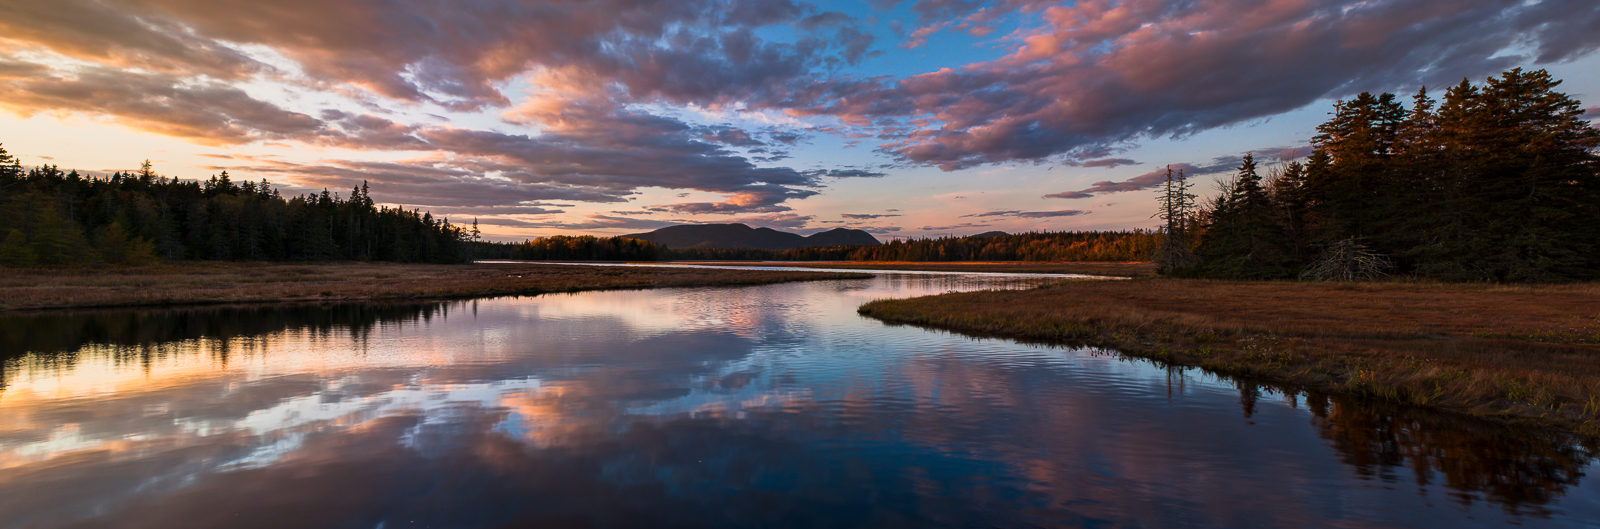 Maine Reflections,Acadia National Park, Maine, Reflections, photo